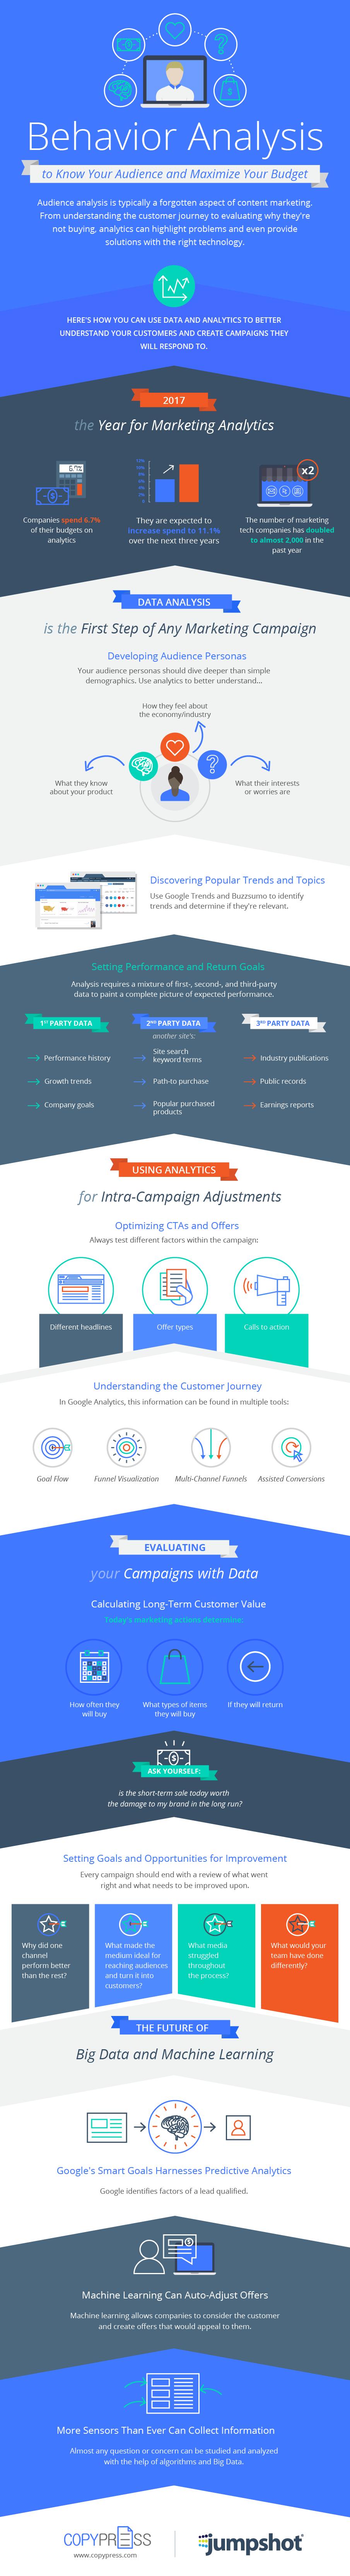 Marketing ROI [Infographic]